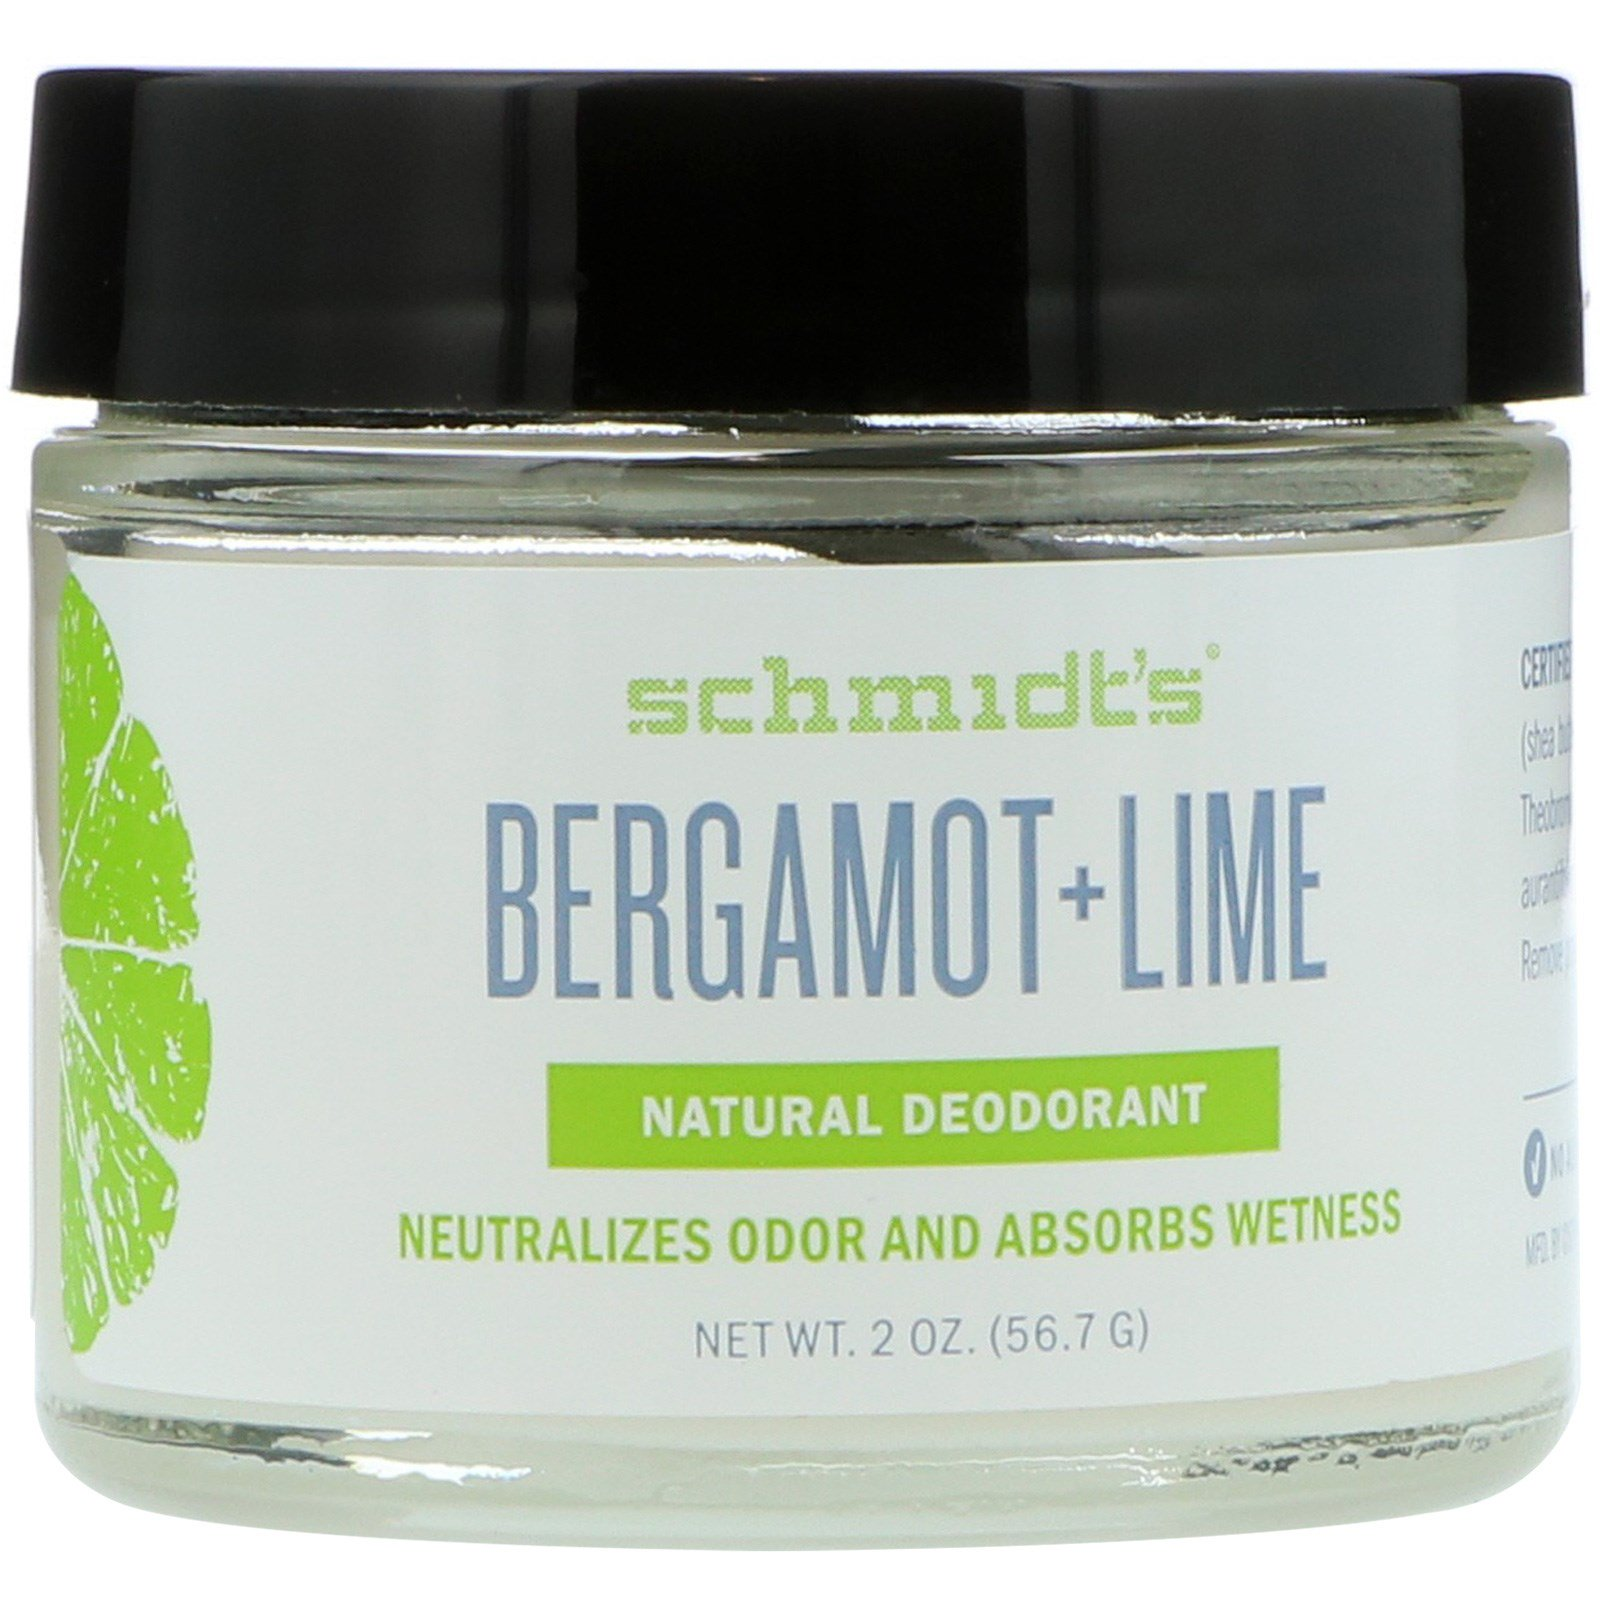 Schmidt's Natural Deodorant, Бергамот + лайм, 2 унц. (56.7 г)